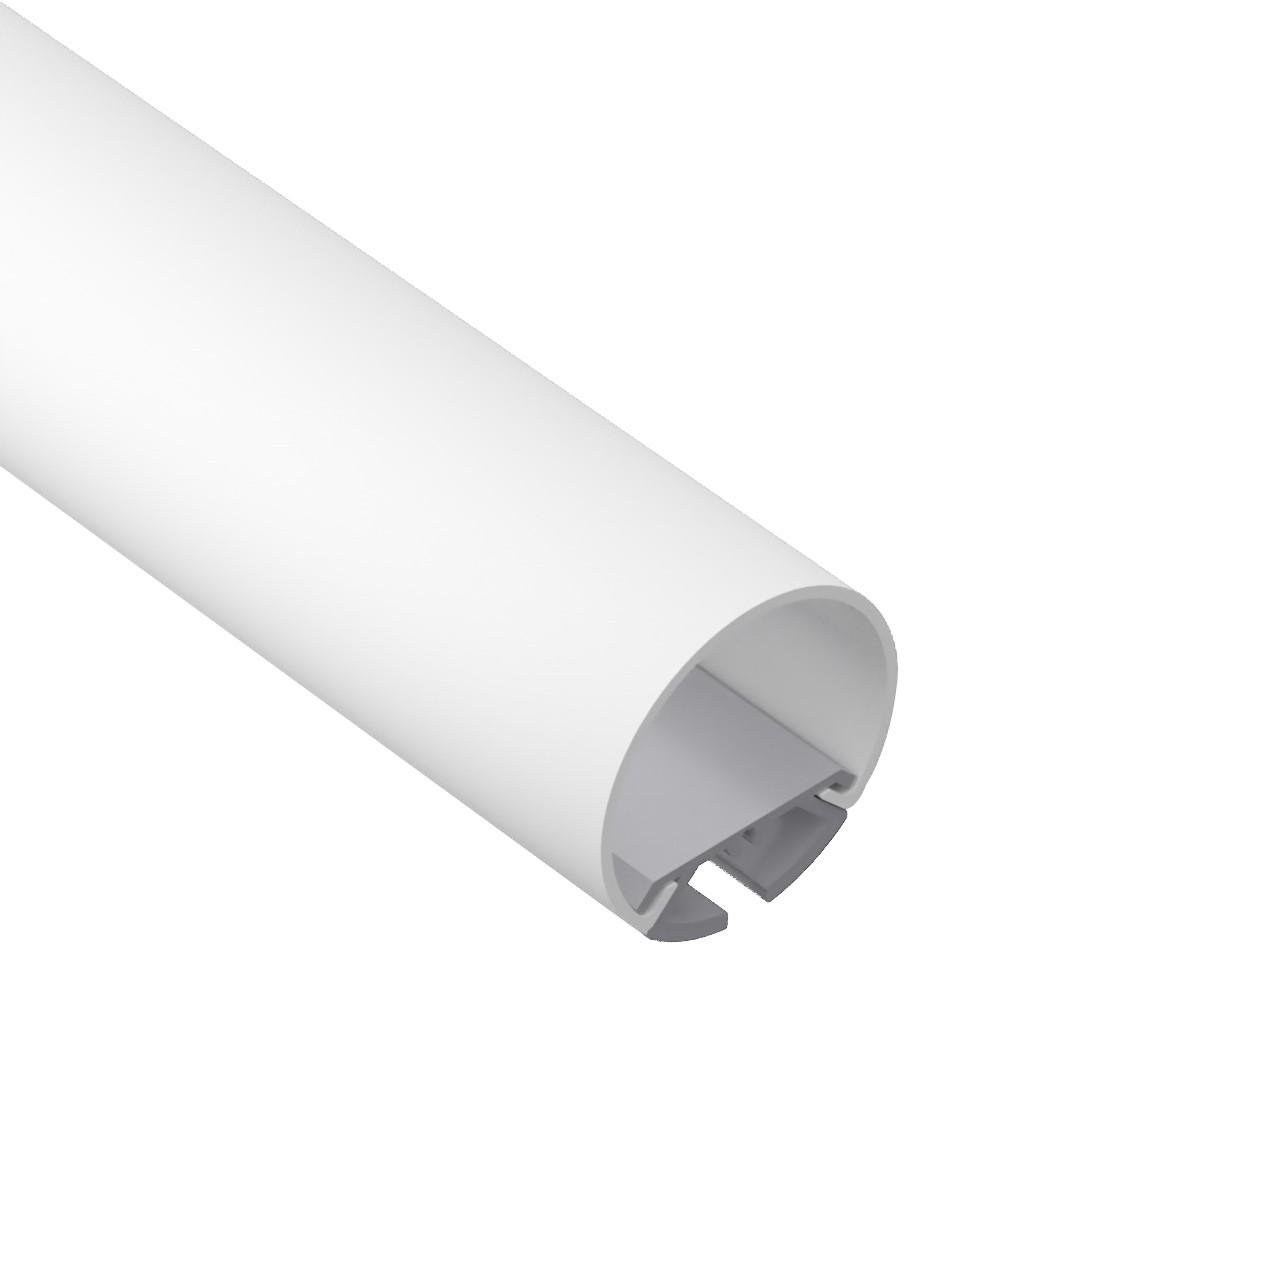 R30 Runde suspenderede LED direkte lys profil dia 30mm